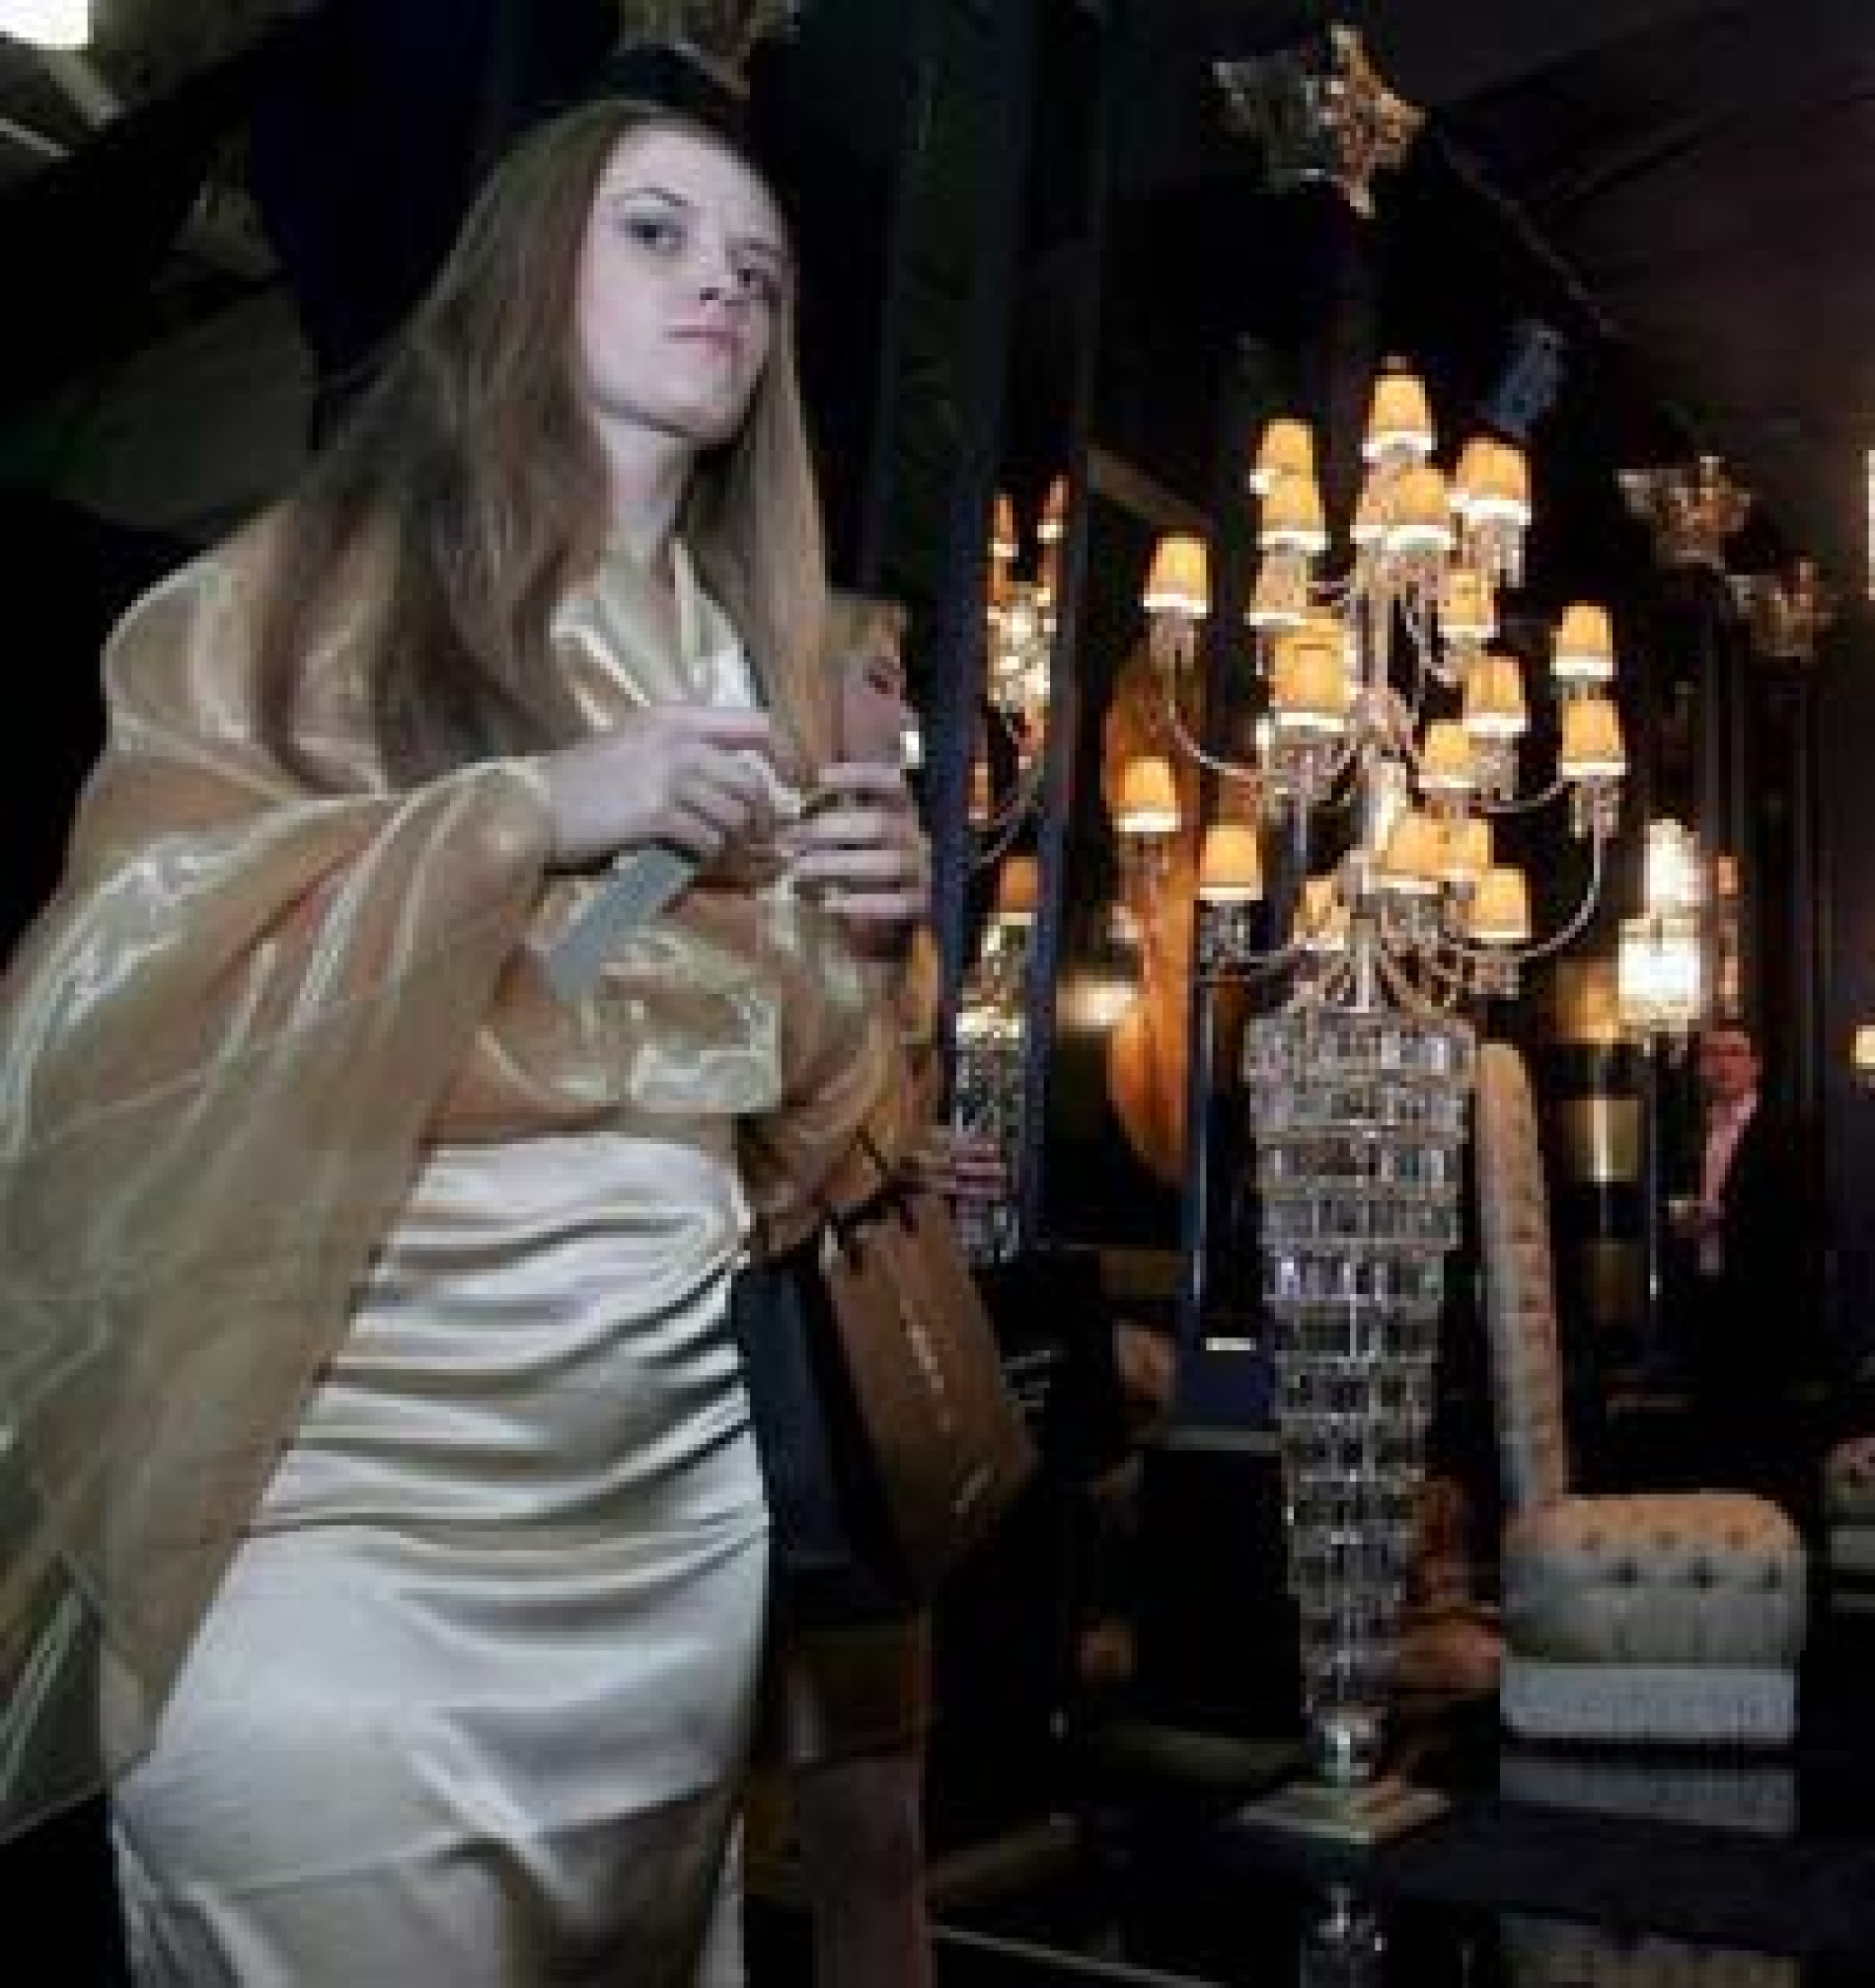 Pfarrwerfen singlespeed Frau kennenlernen in satteins